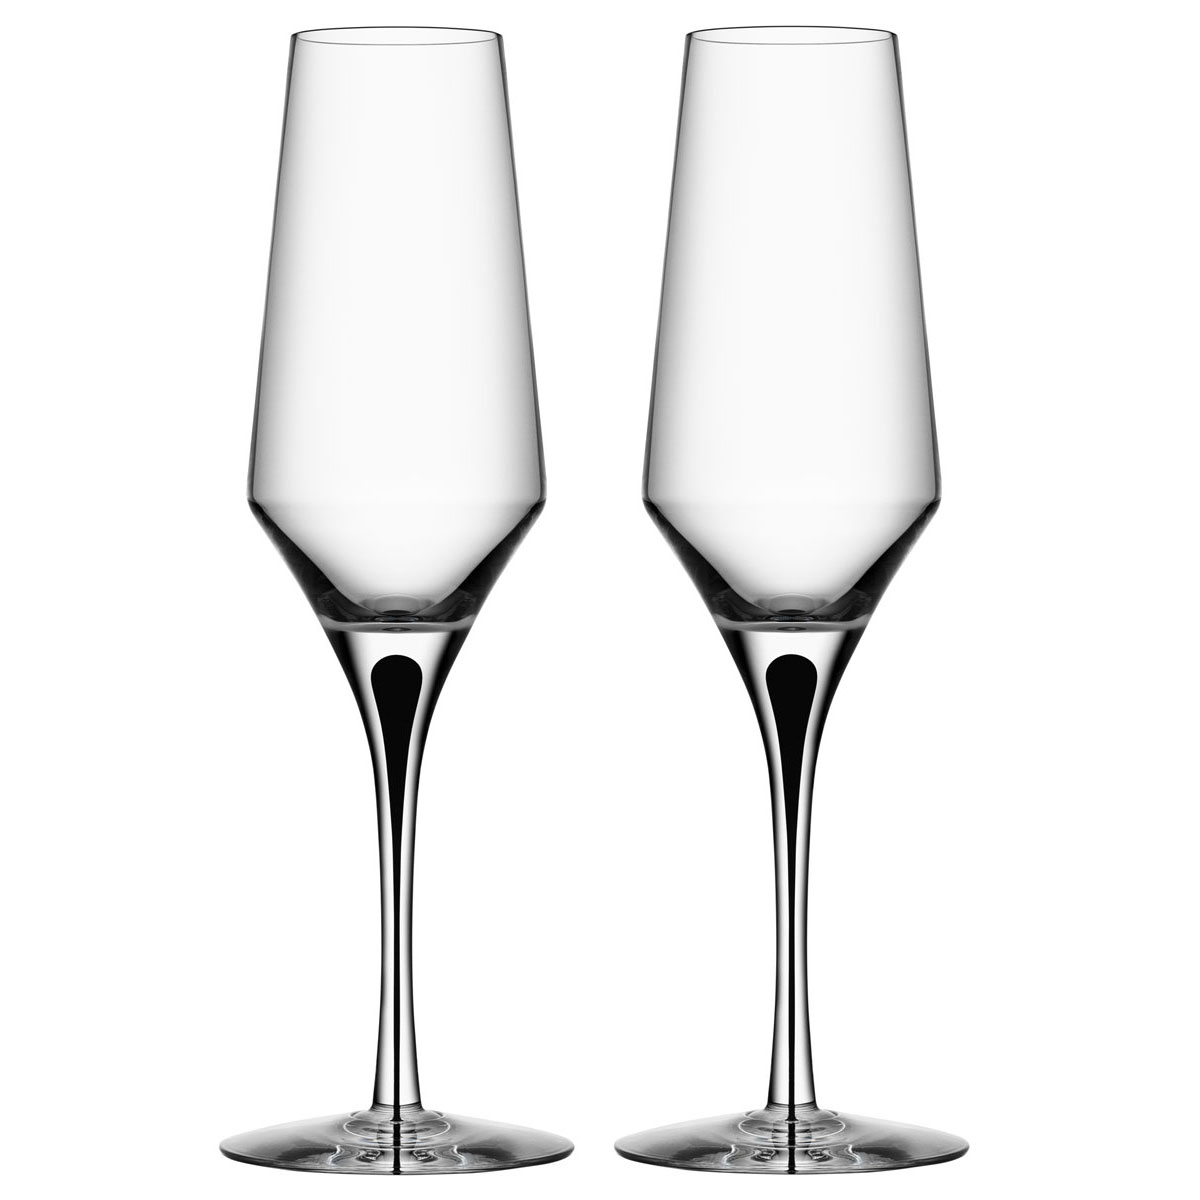 Orrefors Crystal, Metropol Black Champagne Crystal Flute, Pair